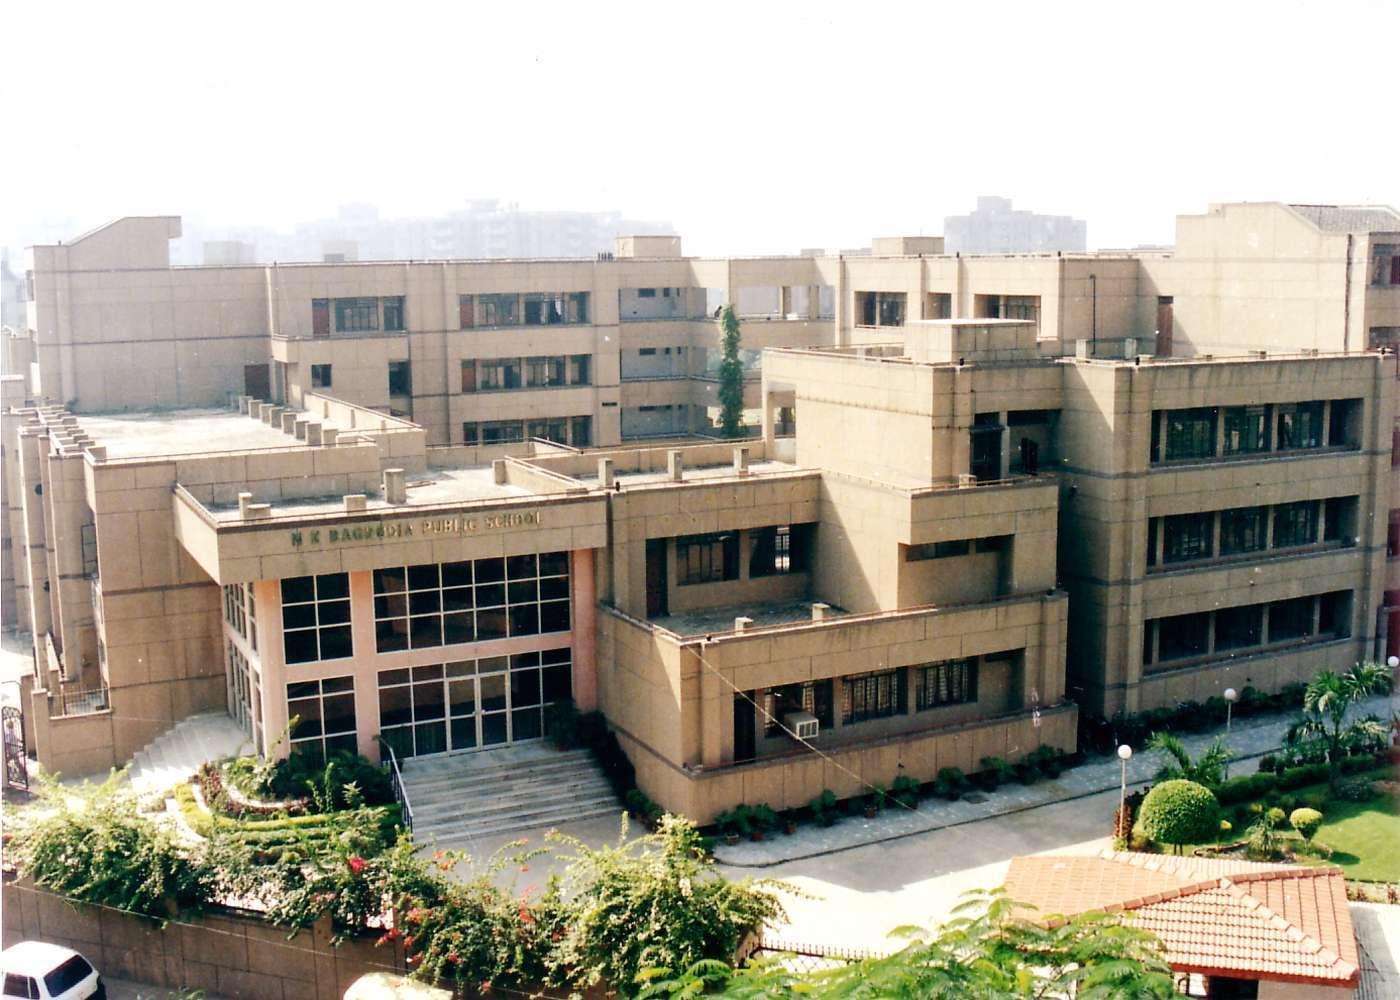 N K BAGRODIA PUBLIC SCHOOL AHINSA MARG SECTOR 9 ROHINI DELHI 2730244